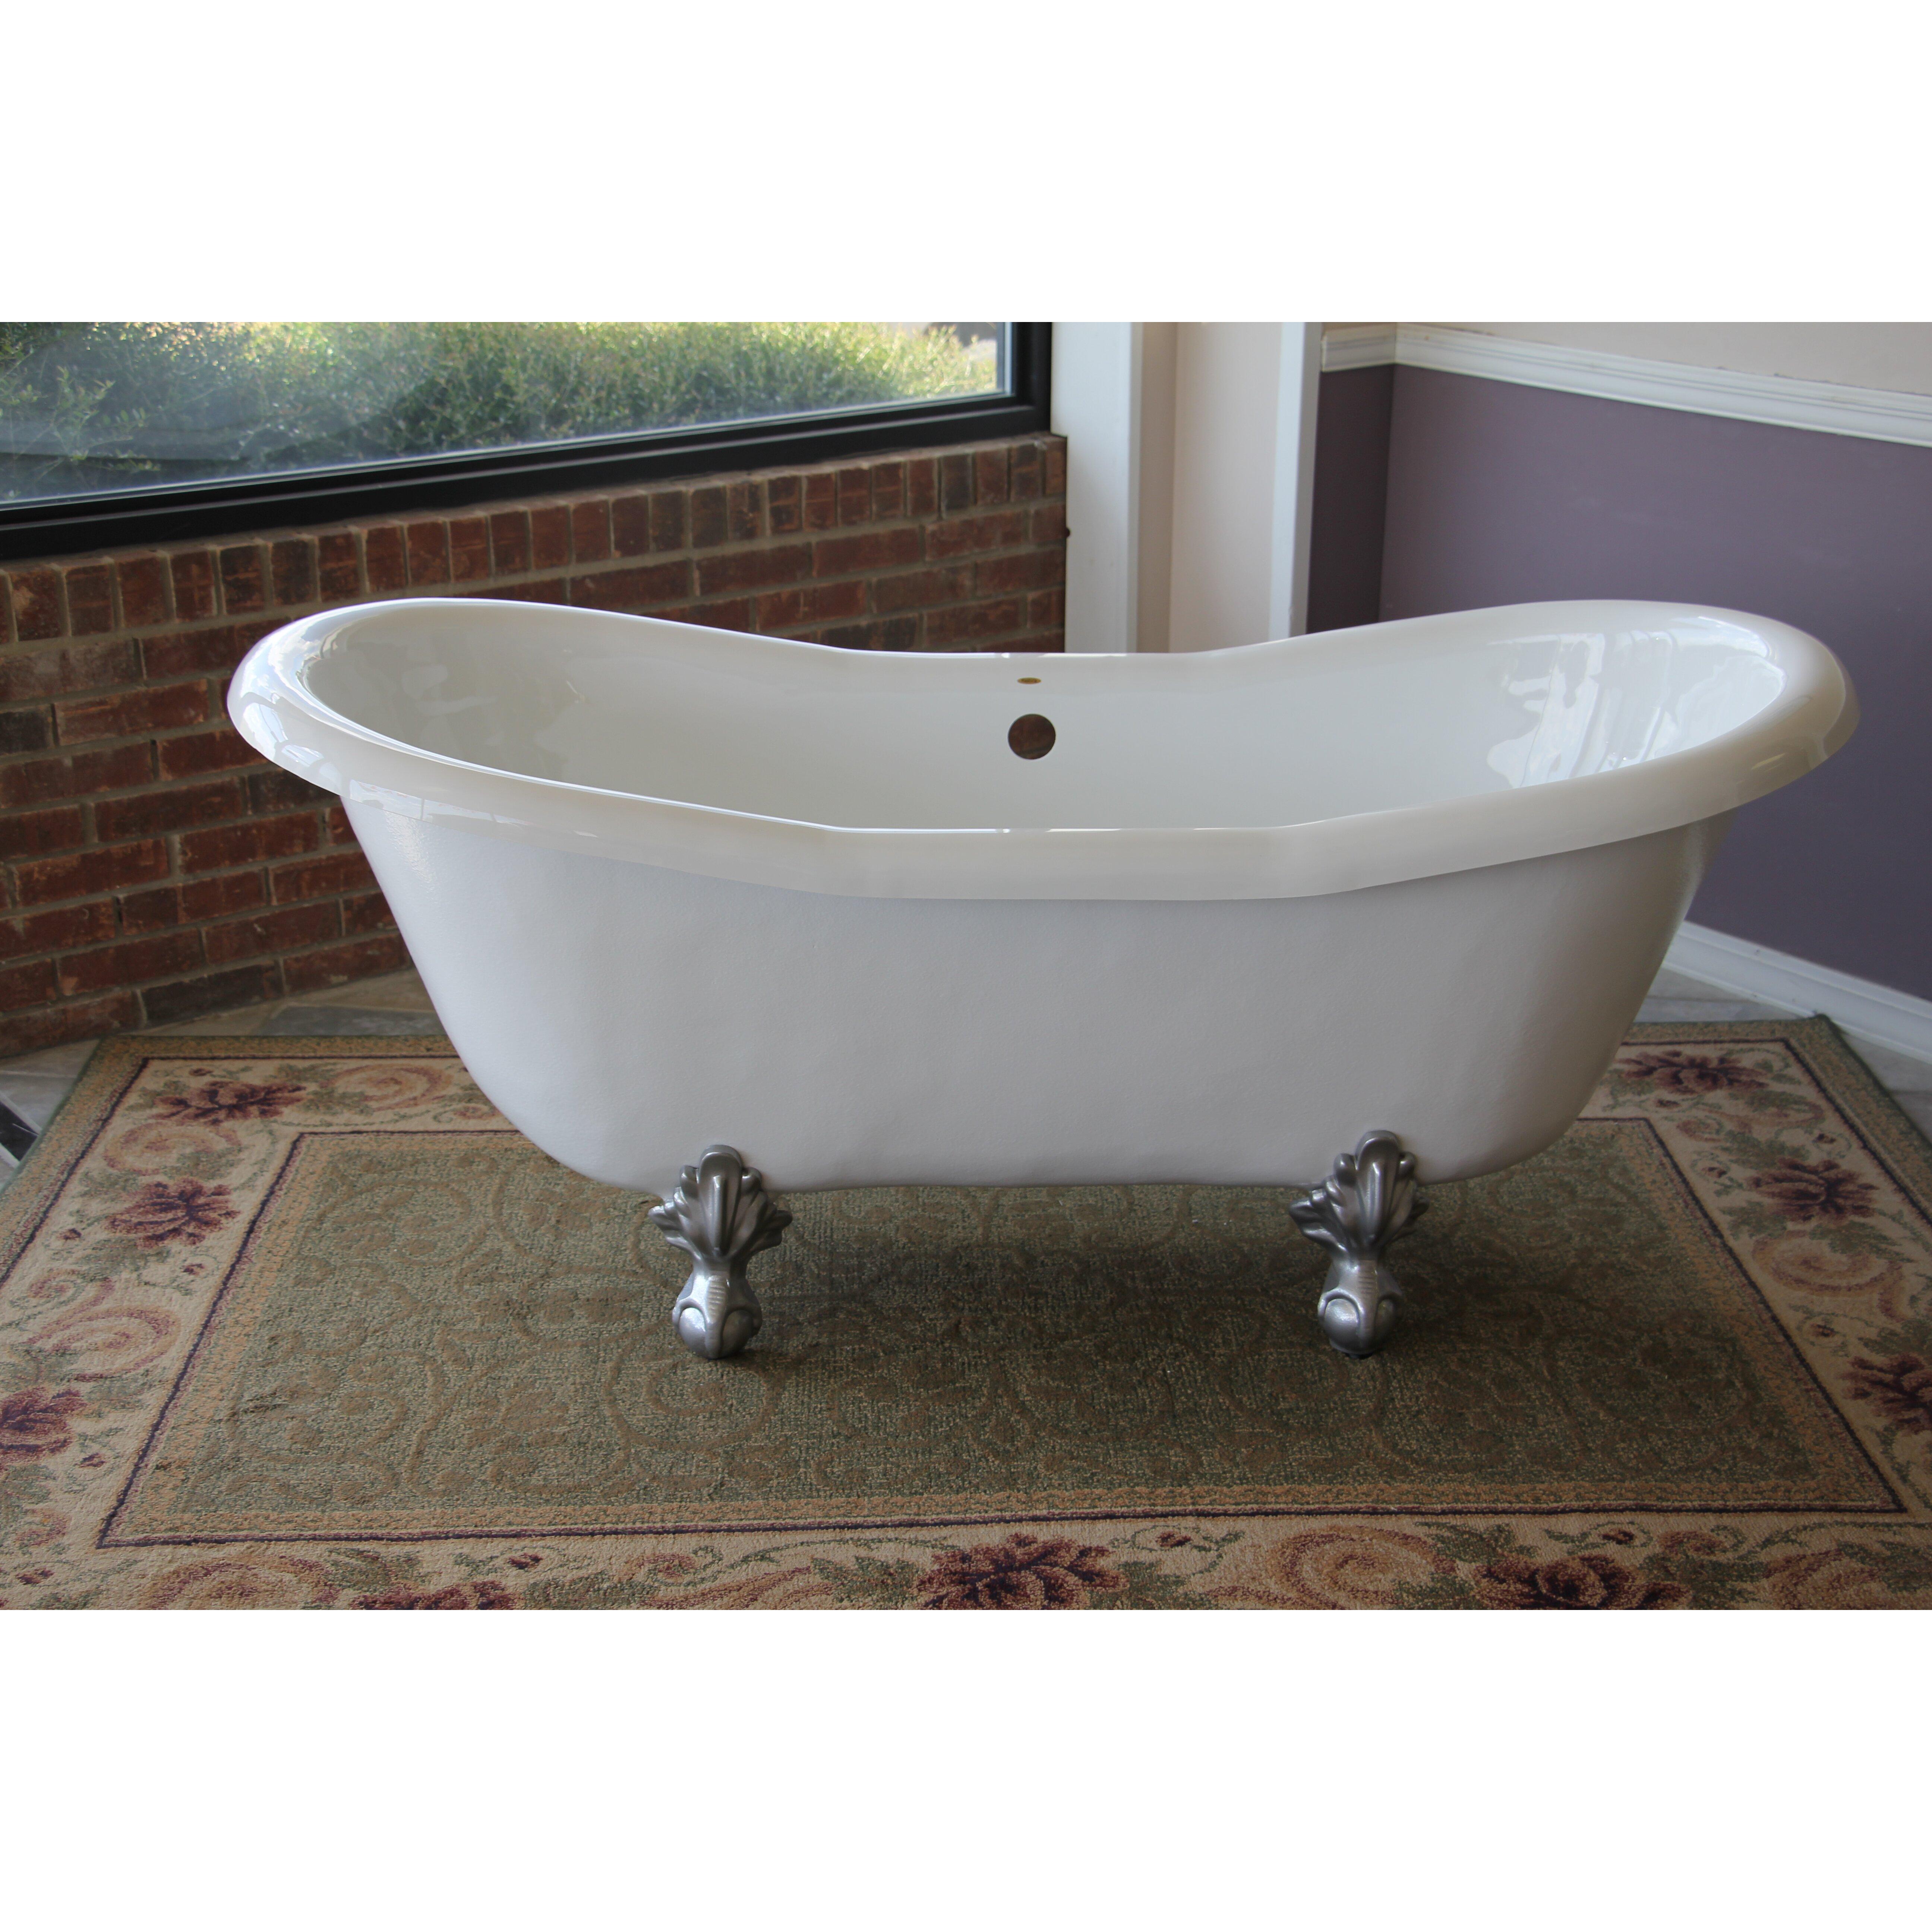 Restoria bathtub company duchess 68 x 30 bathtub for A table restoria